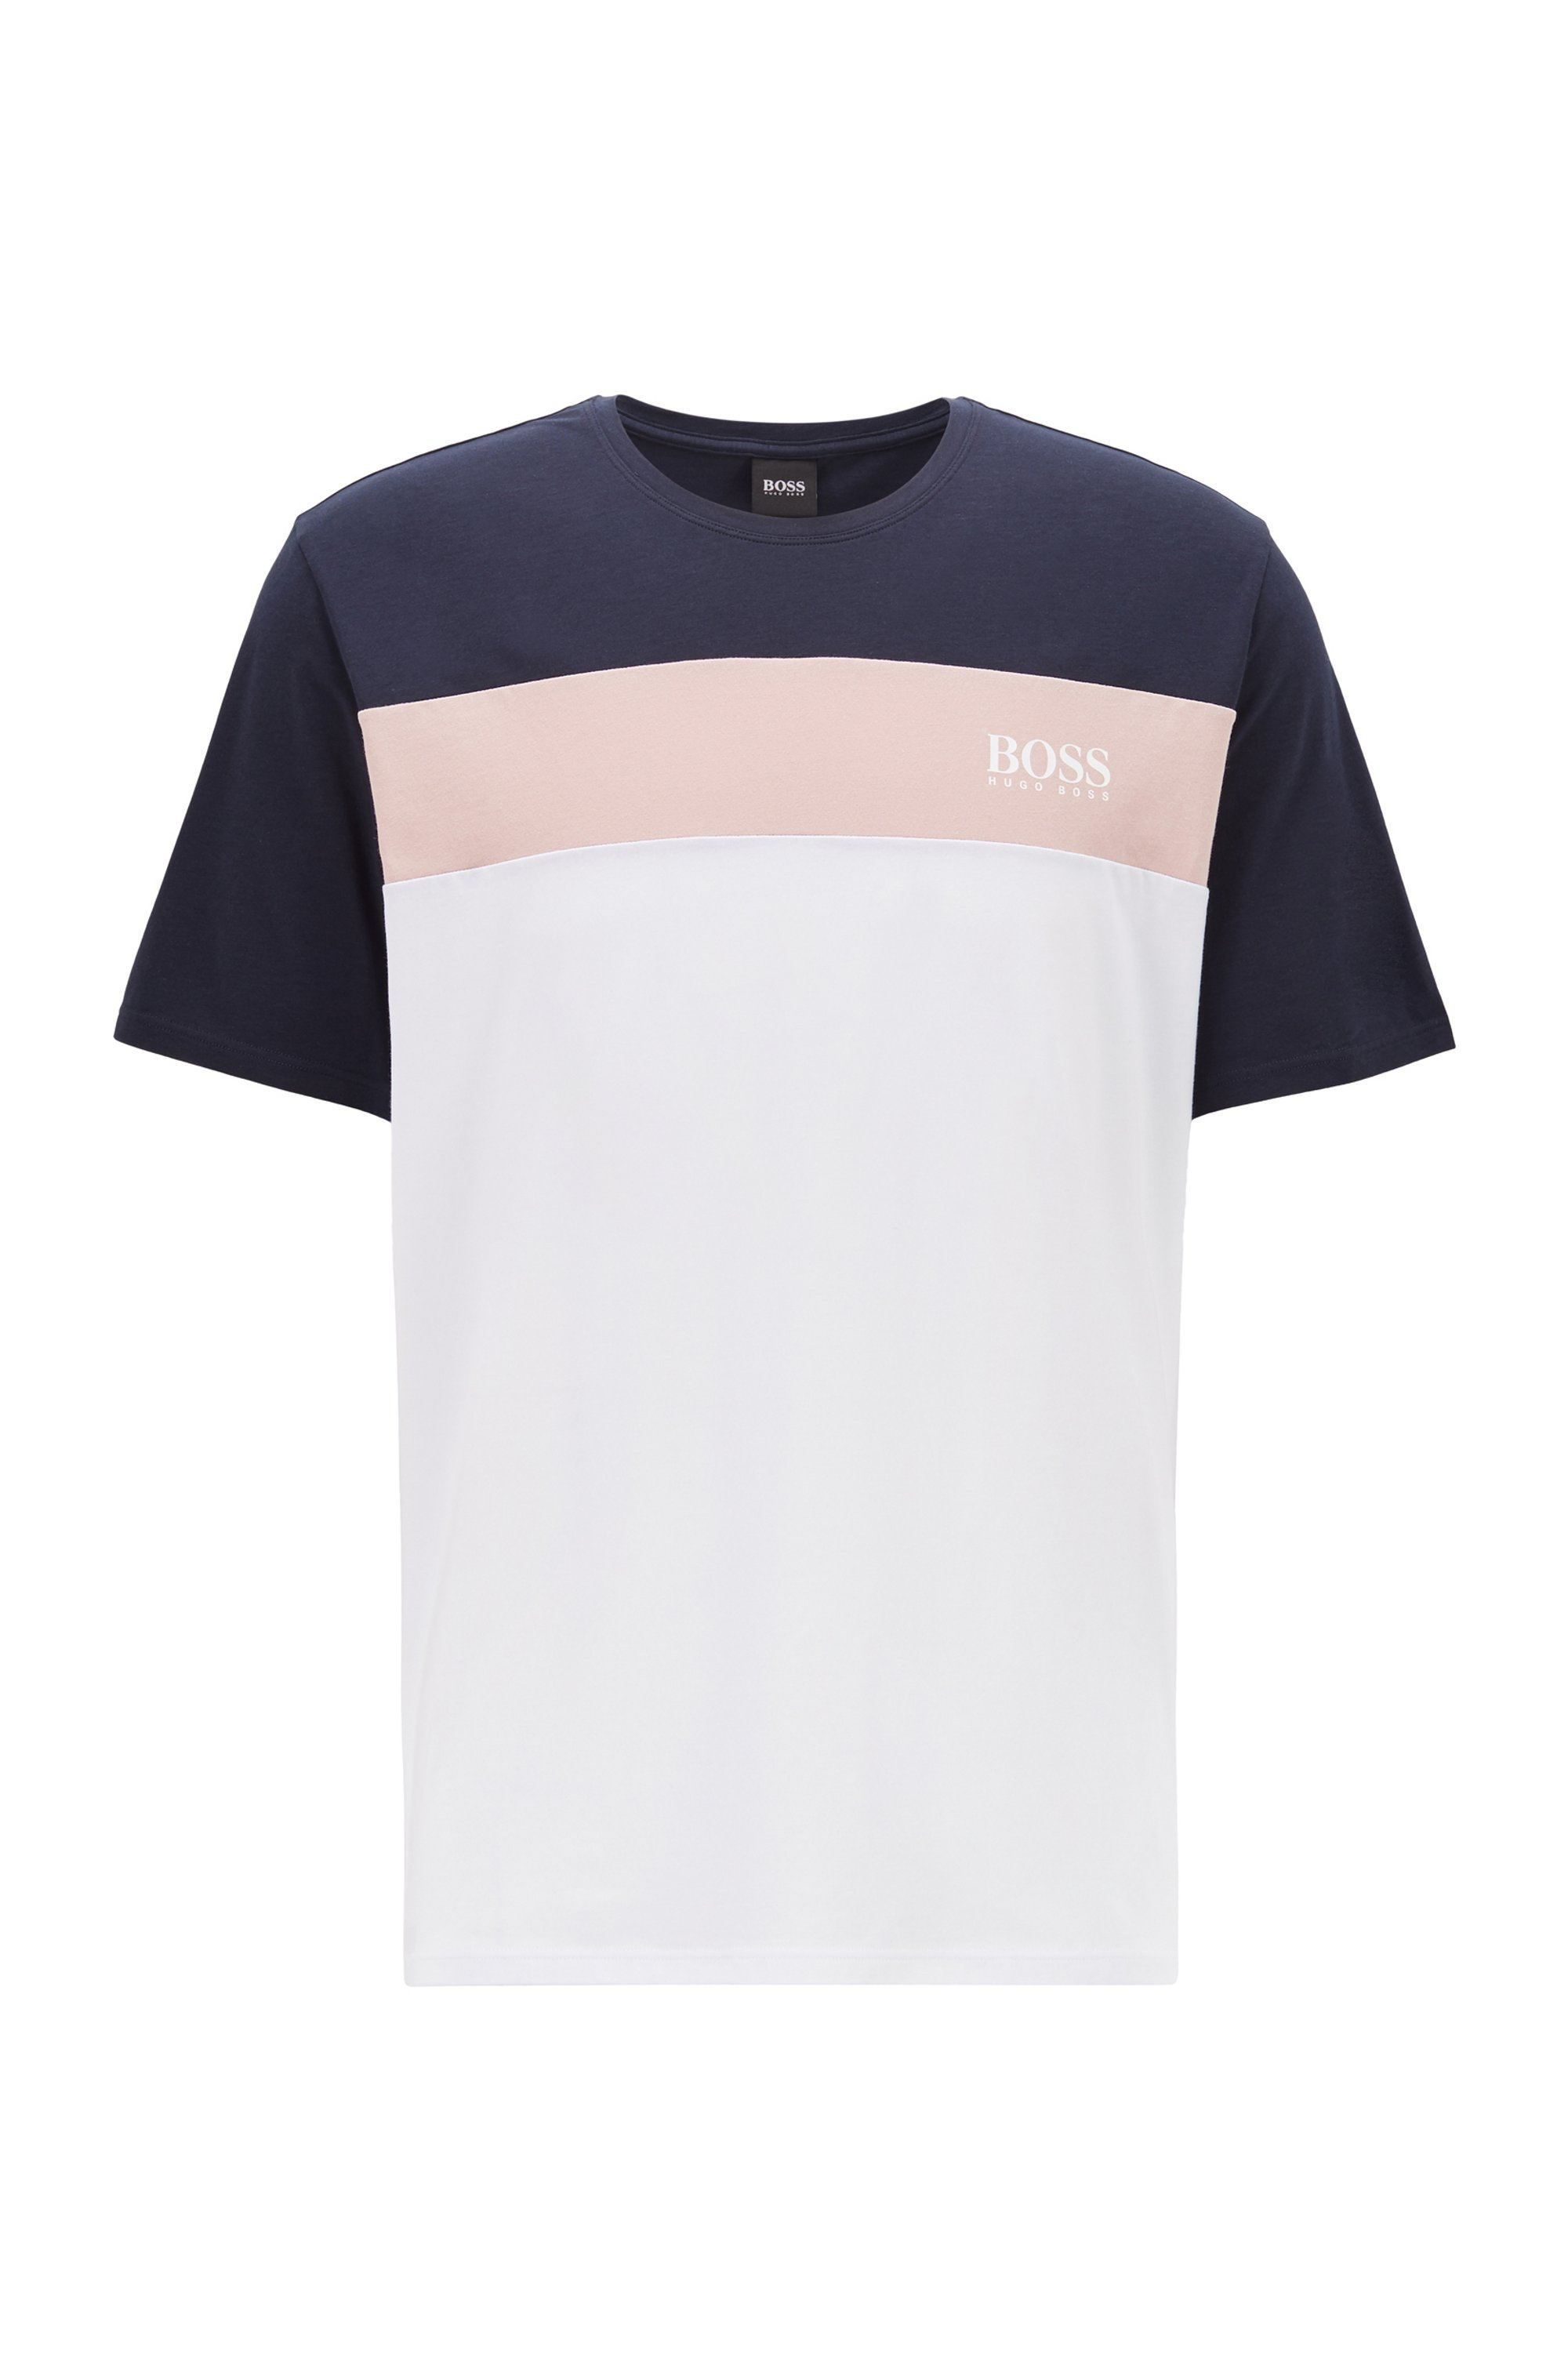 Pyjama-Shirt aus Pima-Baumwoll-Mix im Colour-Block-Design, Dunkelblau